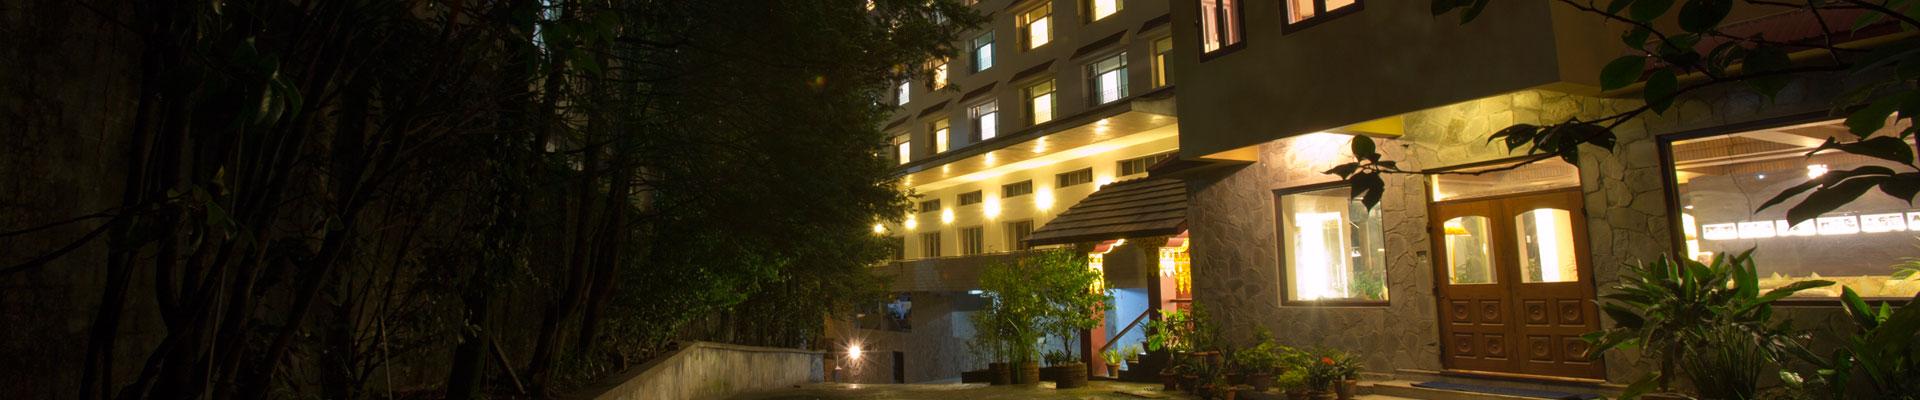 hotel-rendezvous-exterior